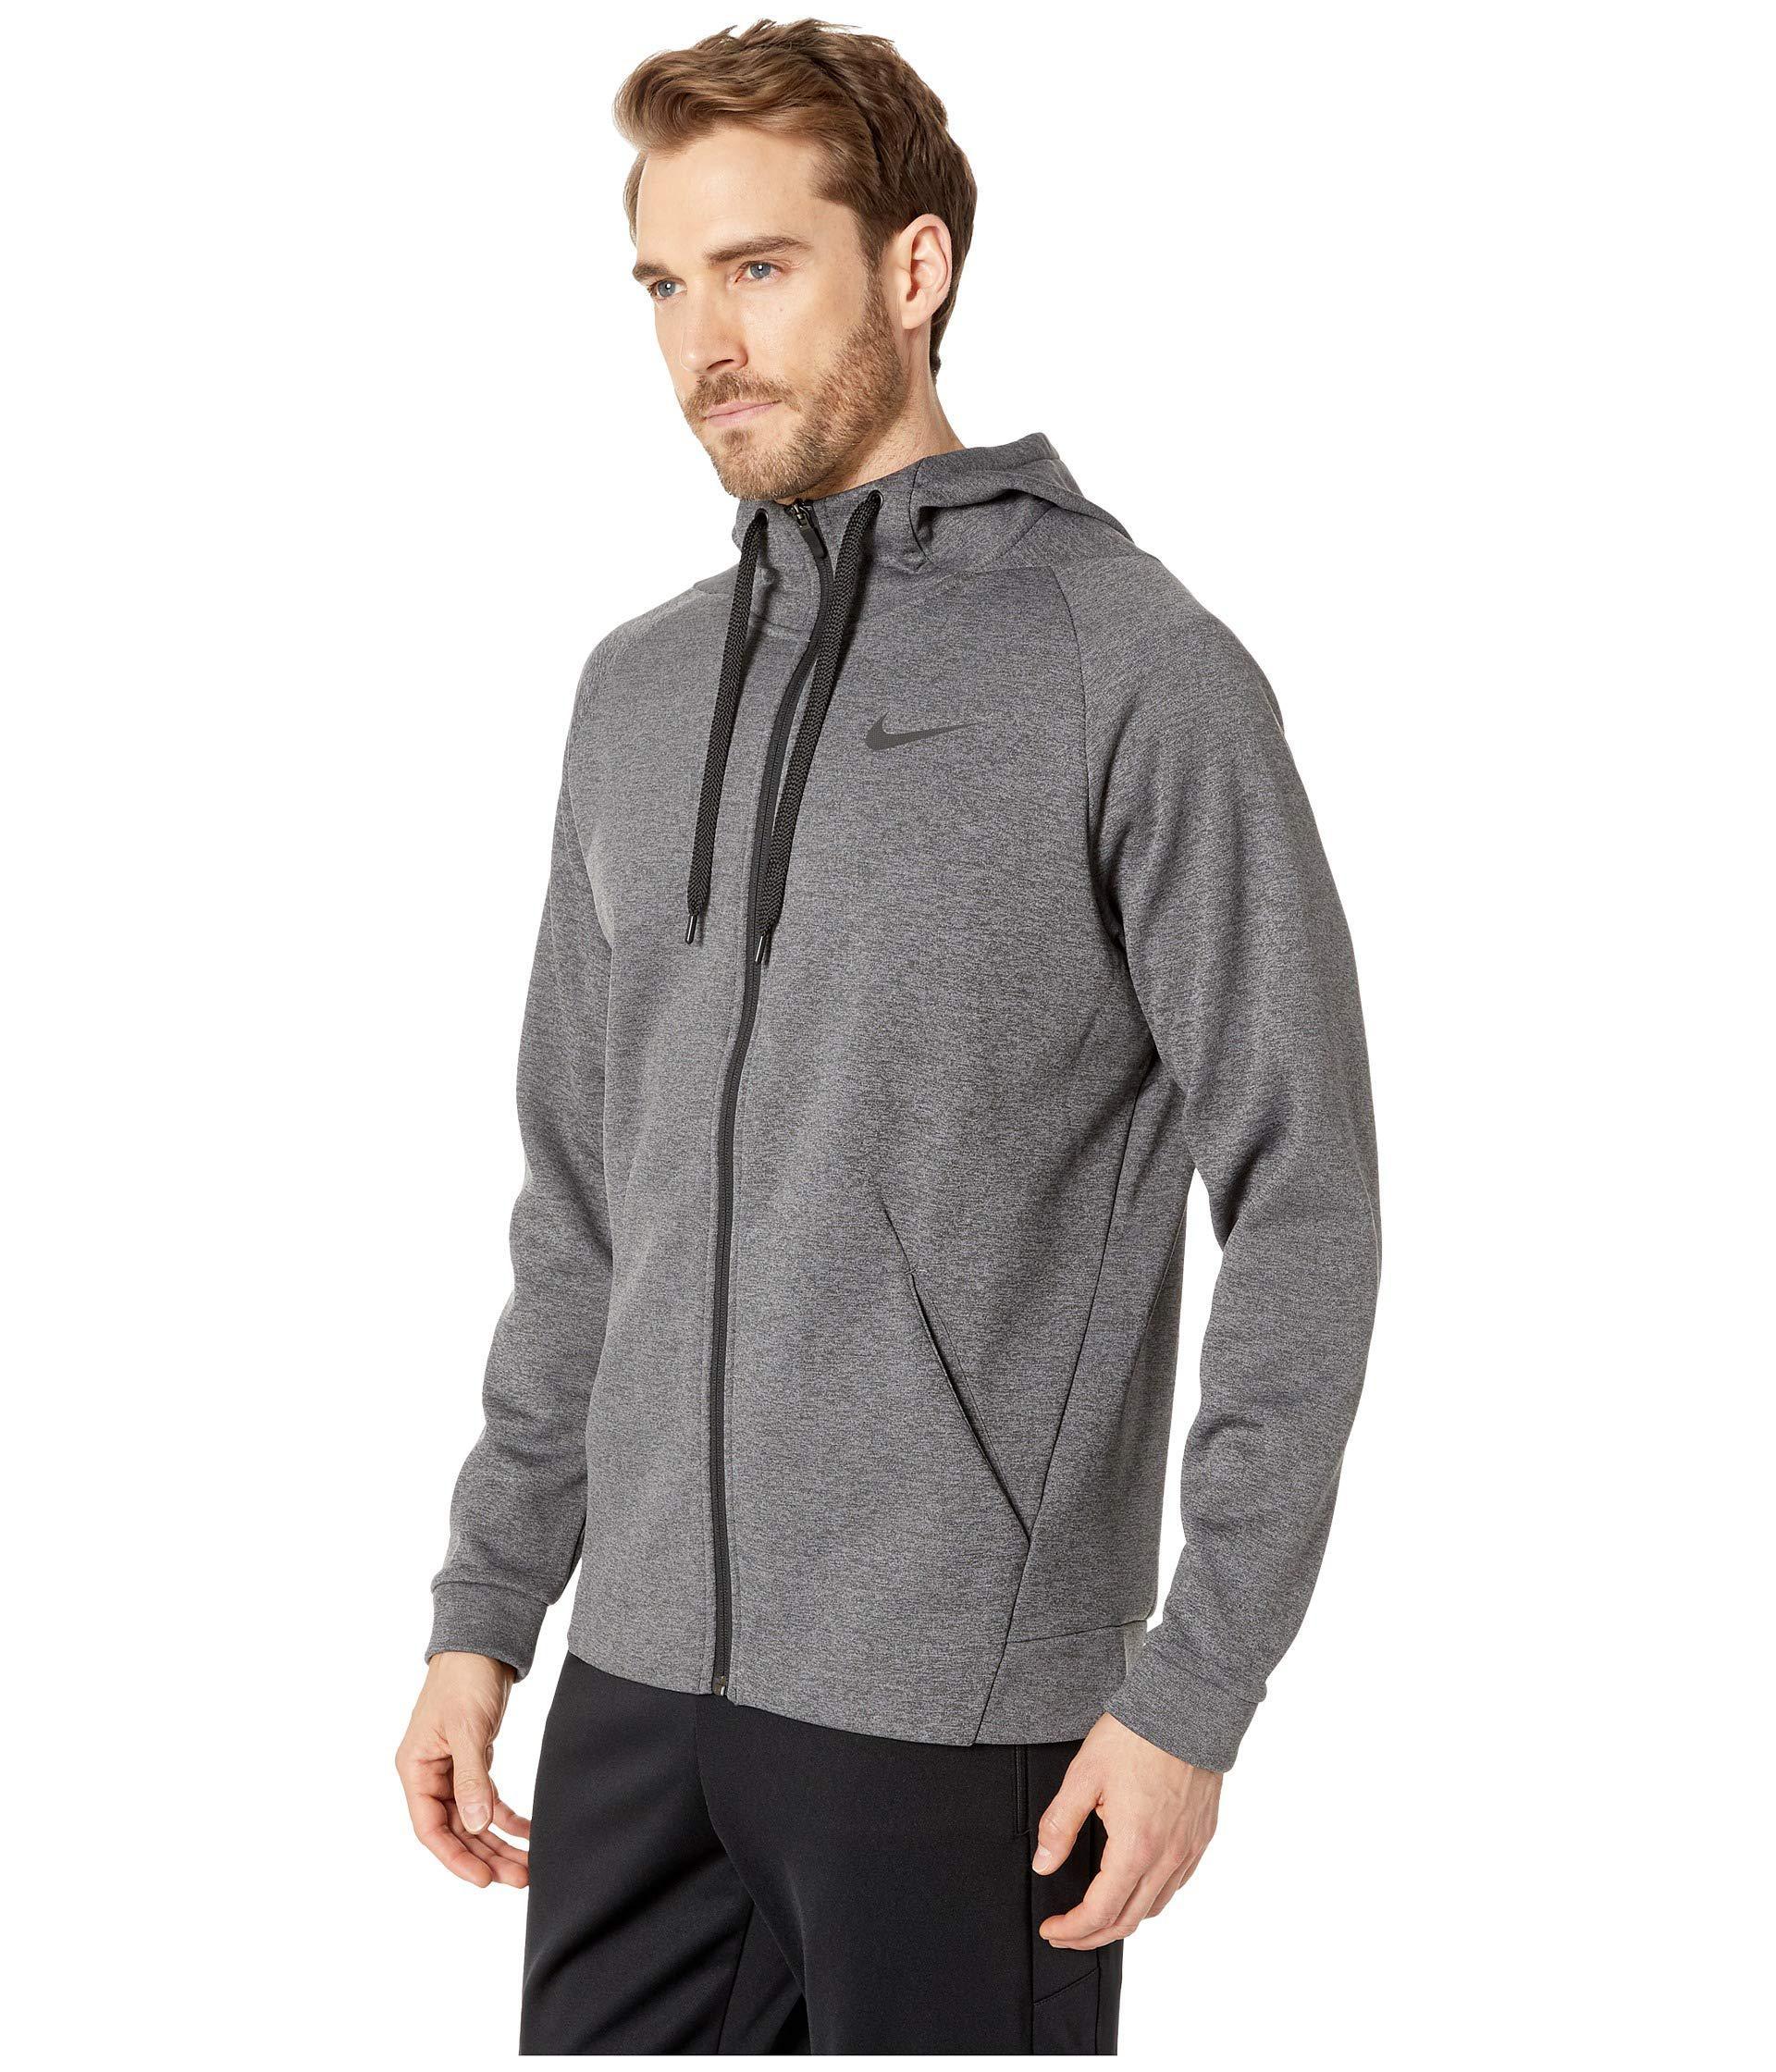 527f18dc09 Lyst - Nike Dri-fit Therma Men s Full-zip Training Hoodie (charcoal  Heather black) Men s Sweatshirt in Gray for Men